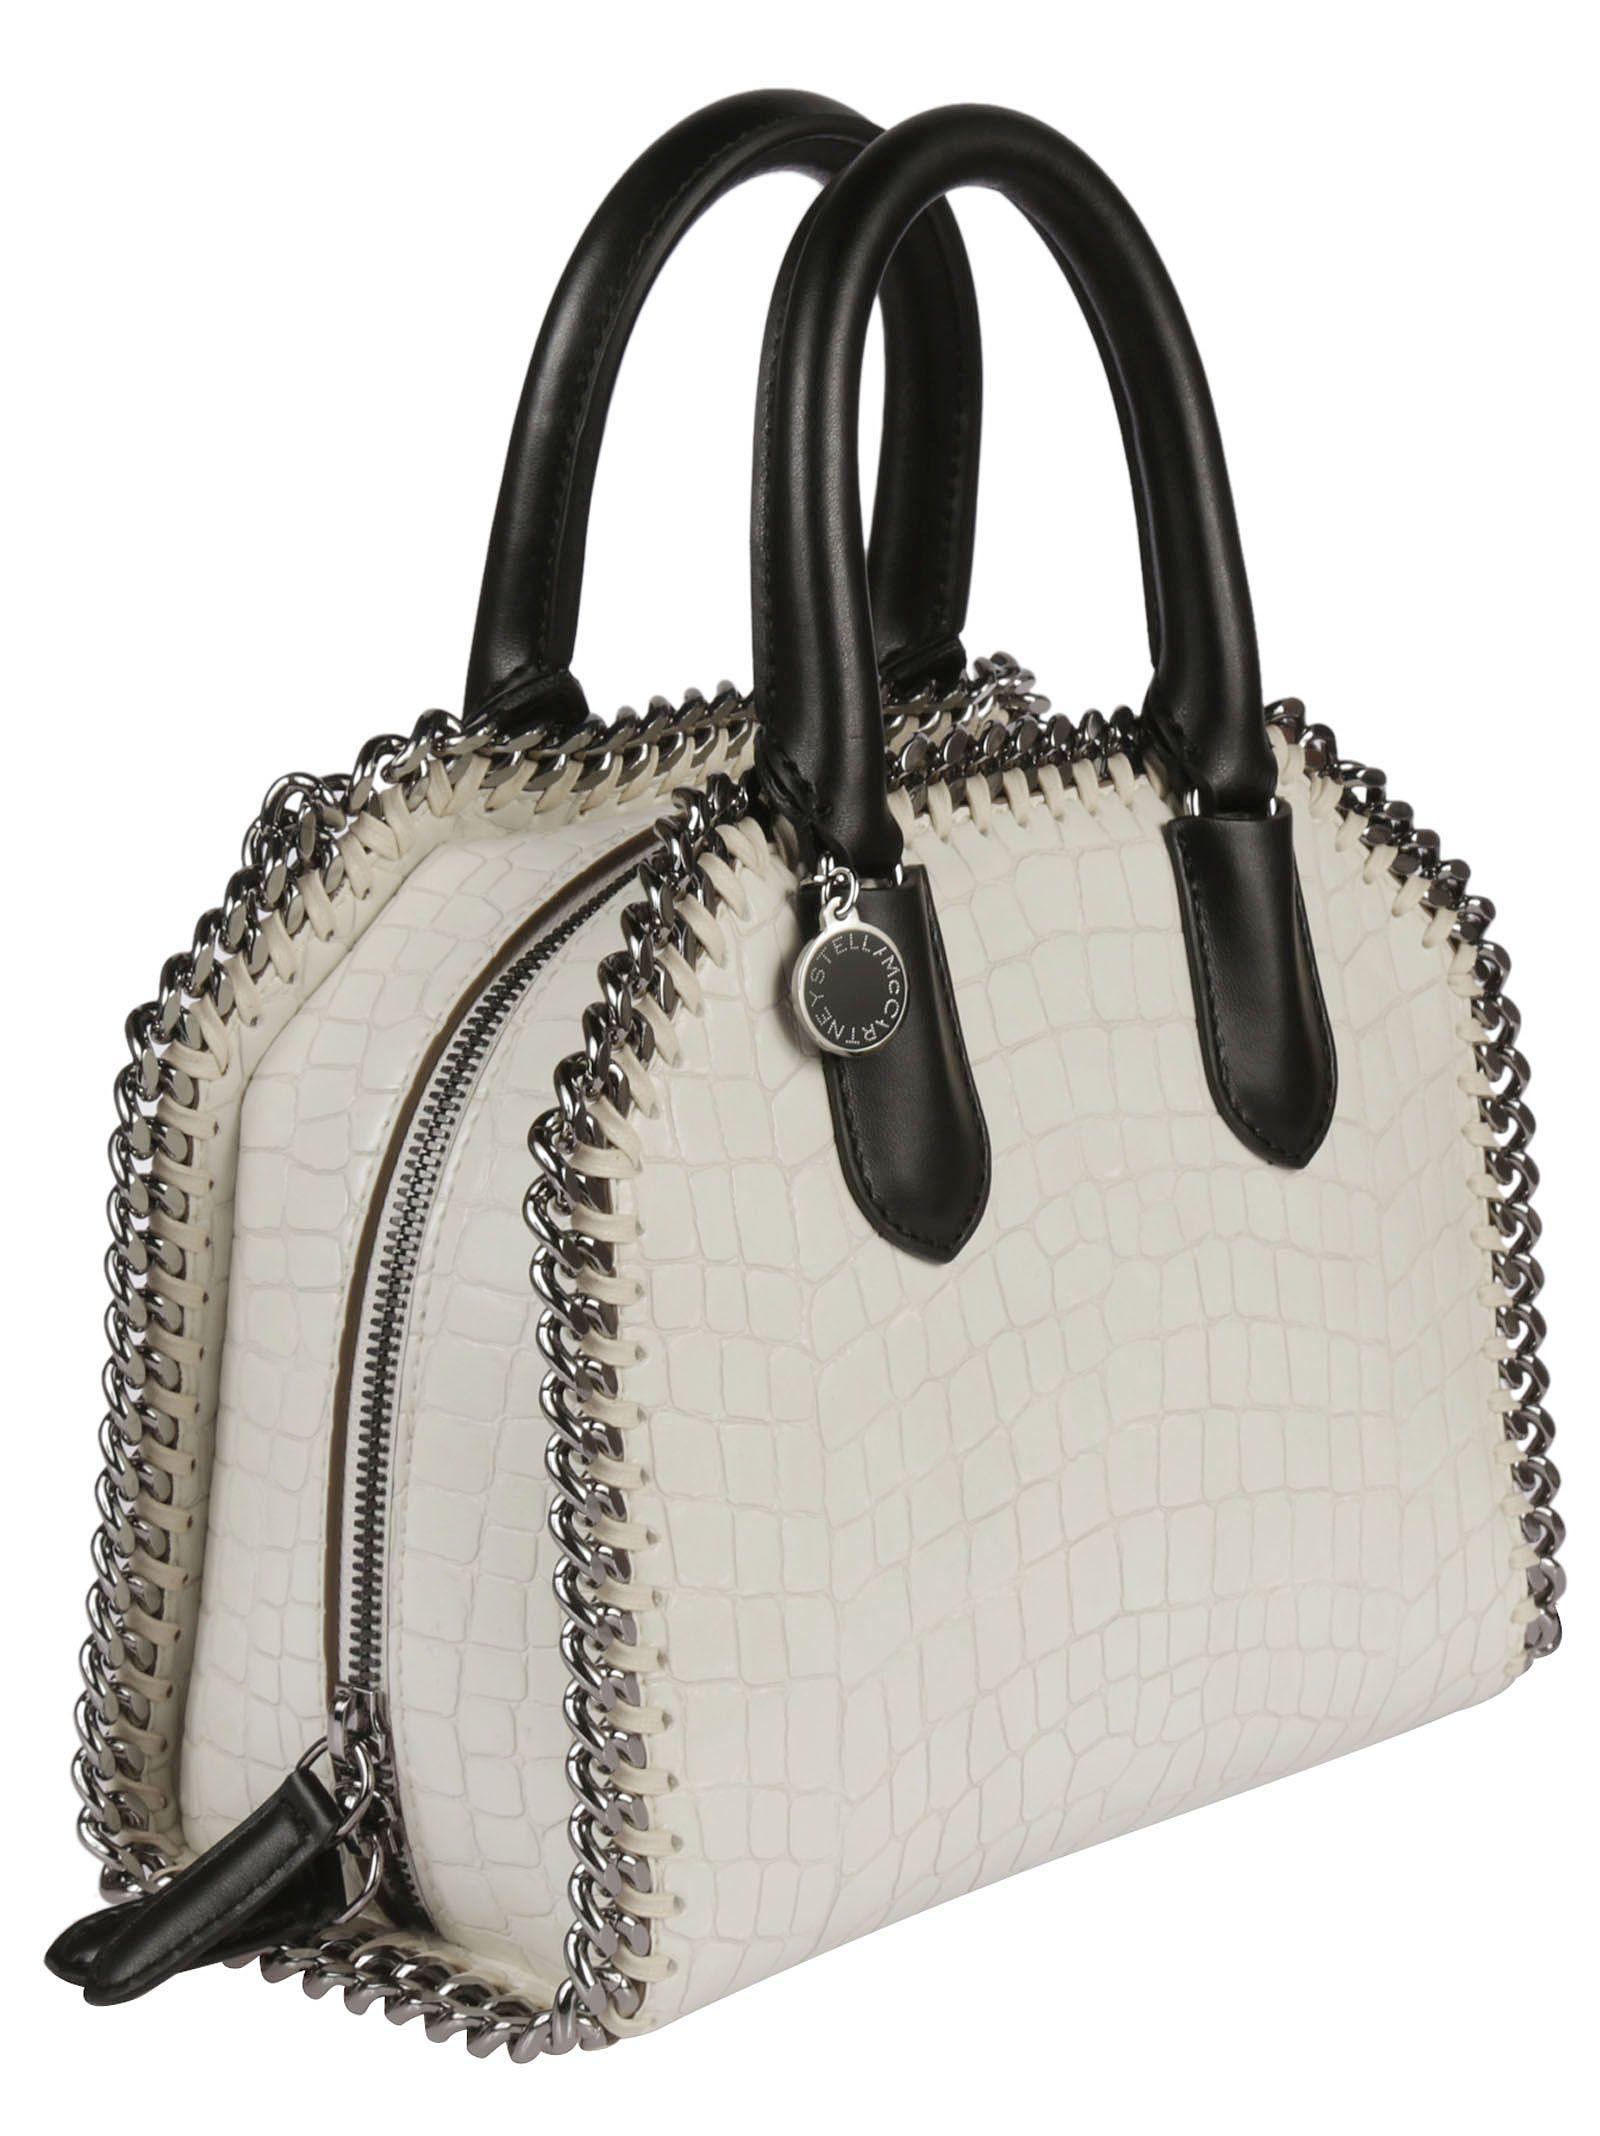 7fabc4d446 ... Stella McCartney Mini Falabella Snakeskin Effect Shoulder Bag - White  ...